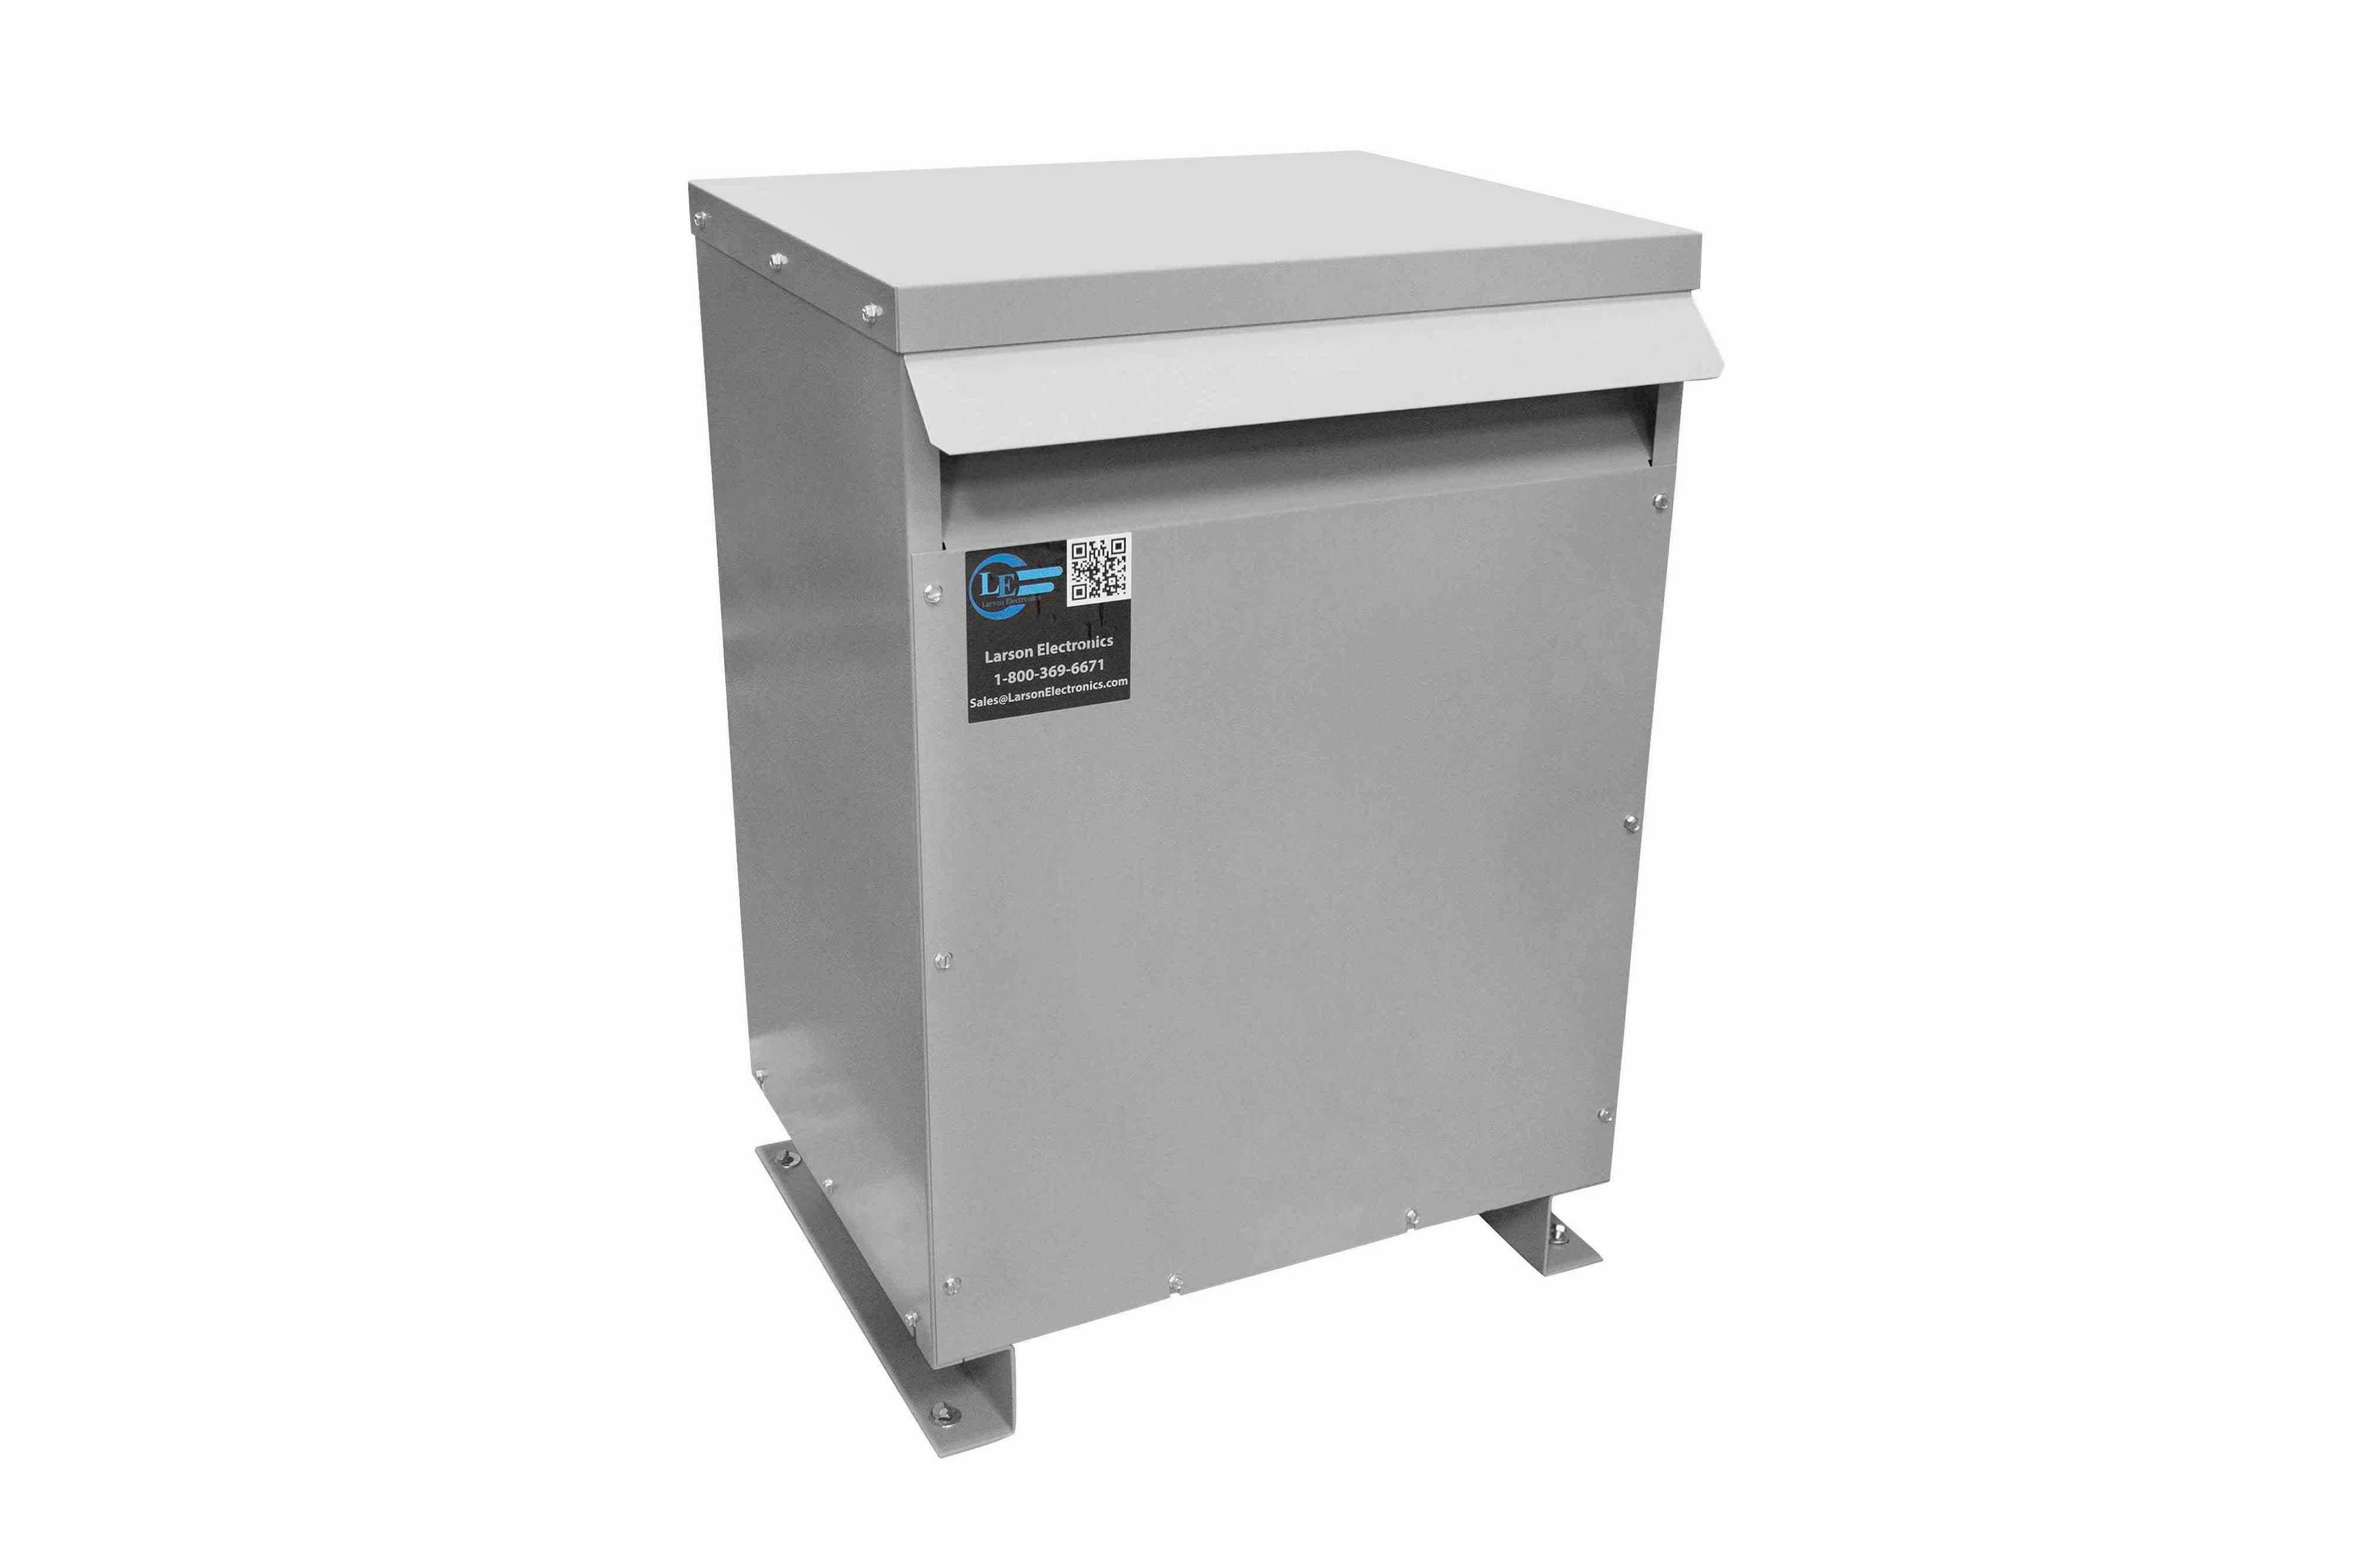 225 kVA 3PH Isolation Transformer, 460V Wye Primary, 240V Delta Secondary, N3R, Ventilated, 60 Hz